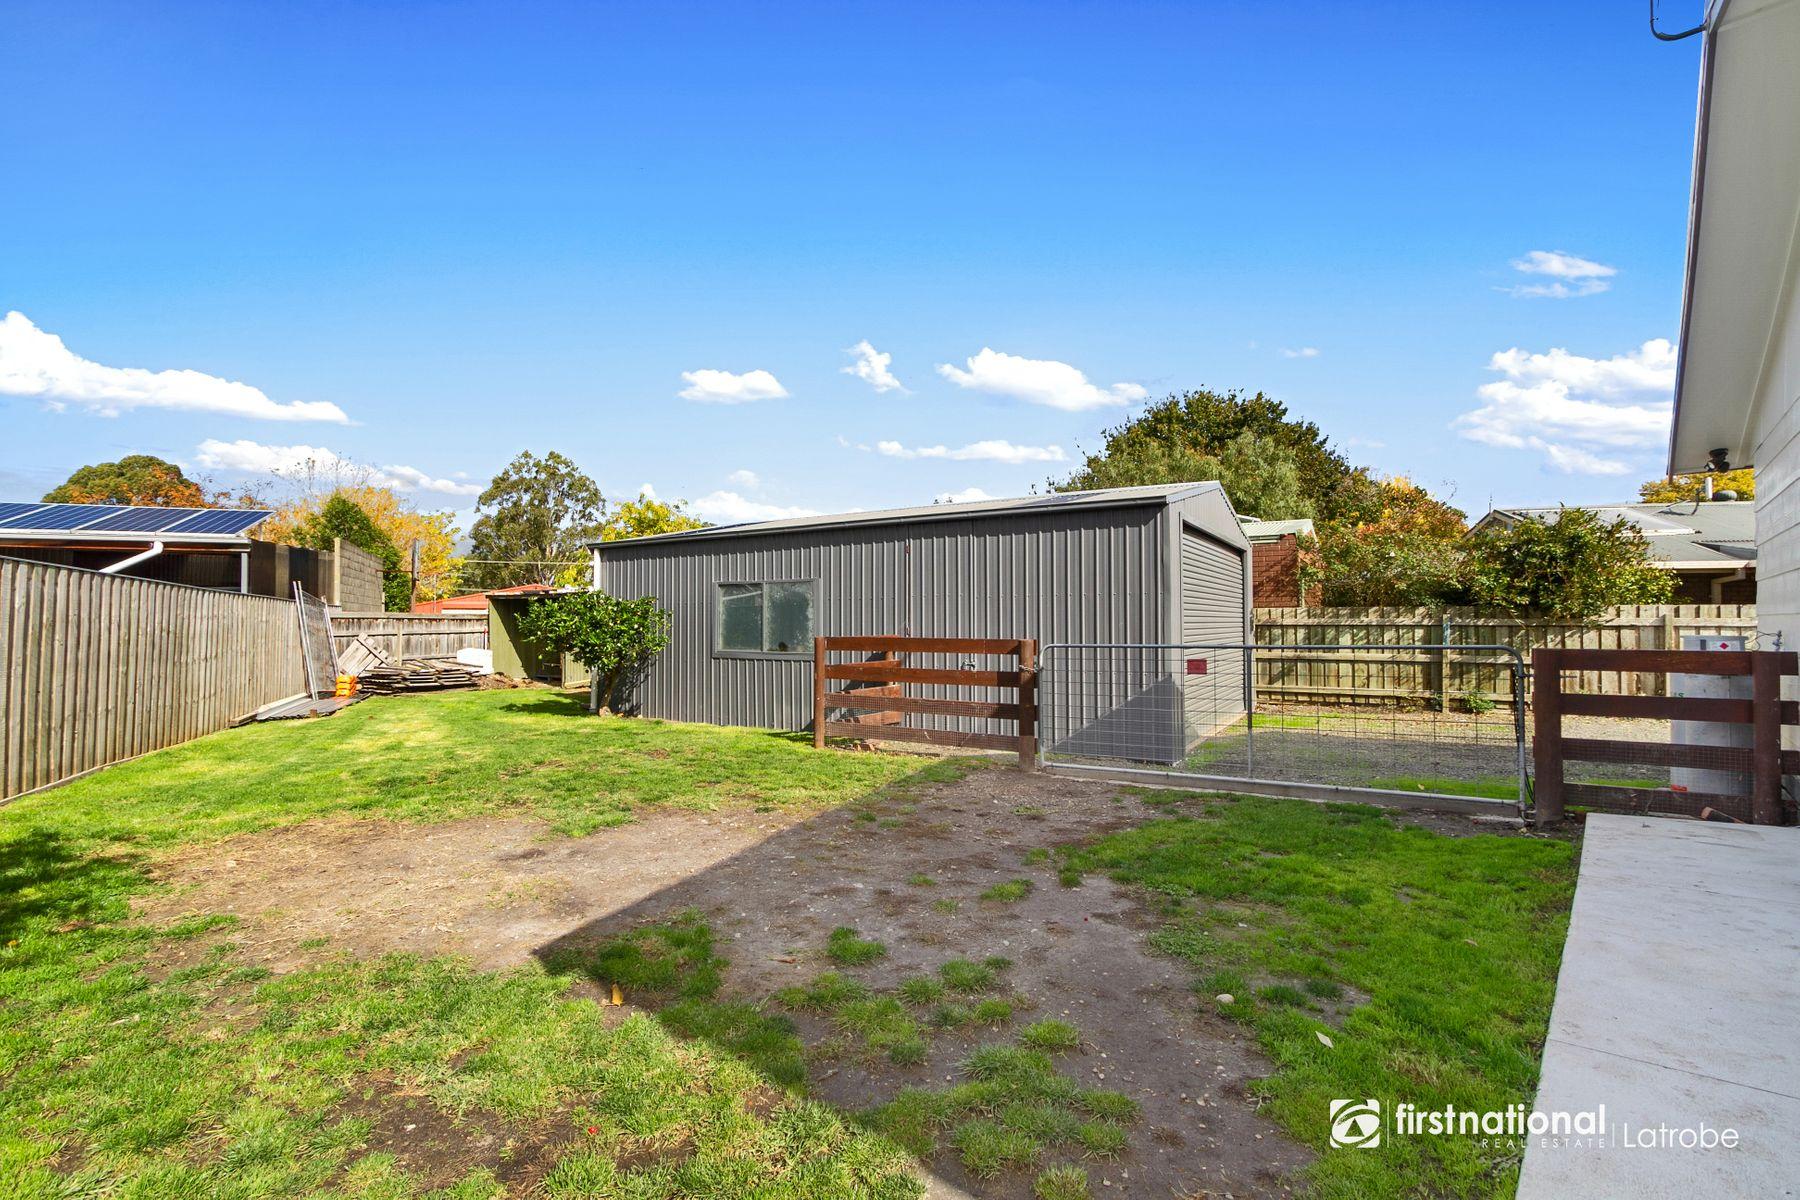 12 Traralgon-Maffra Road, Glengarry, VIC 3854